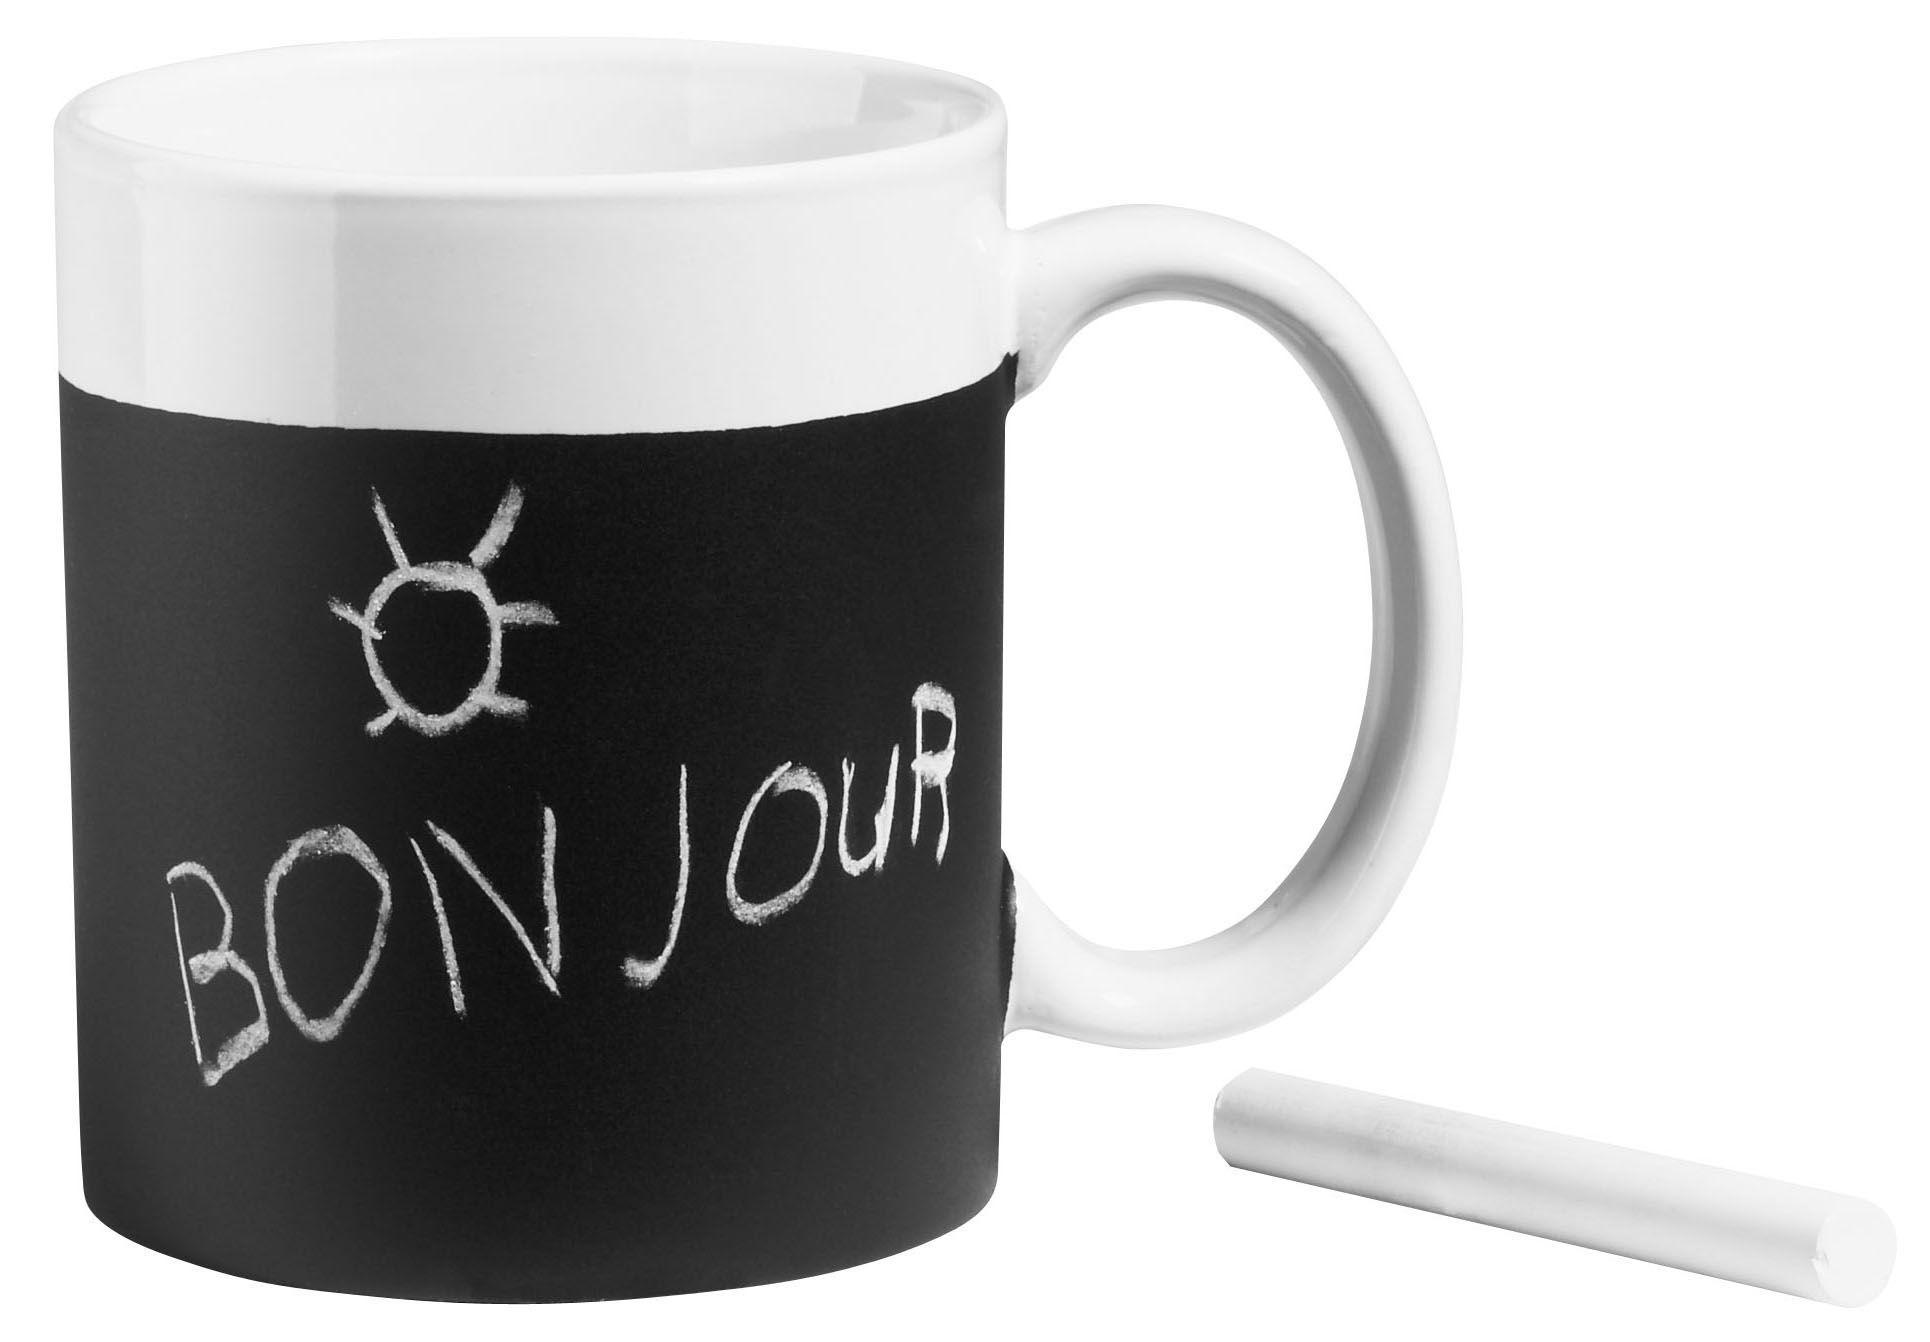 Déco - Tendance humour & décalage - Mug Ardoise ardoise - Virages - Noir - Ardoise, Céramique